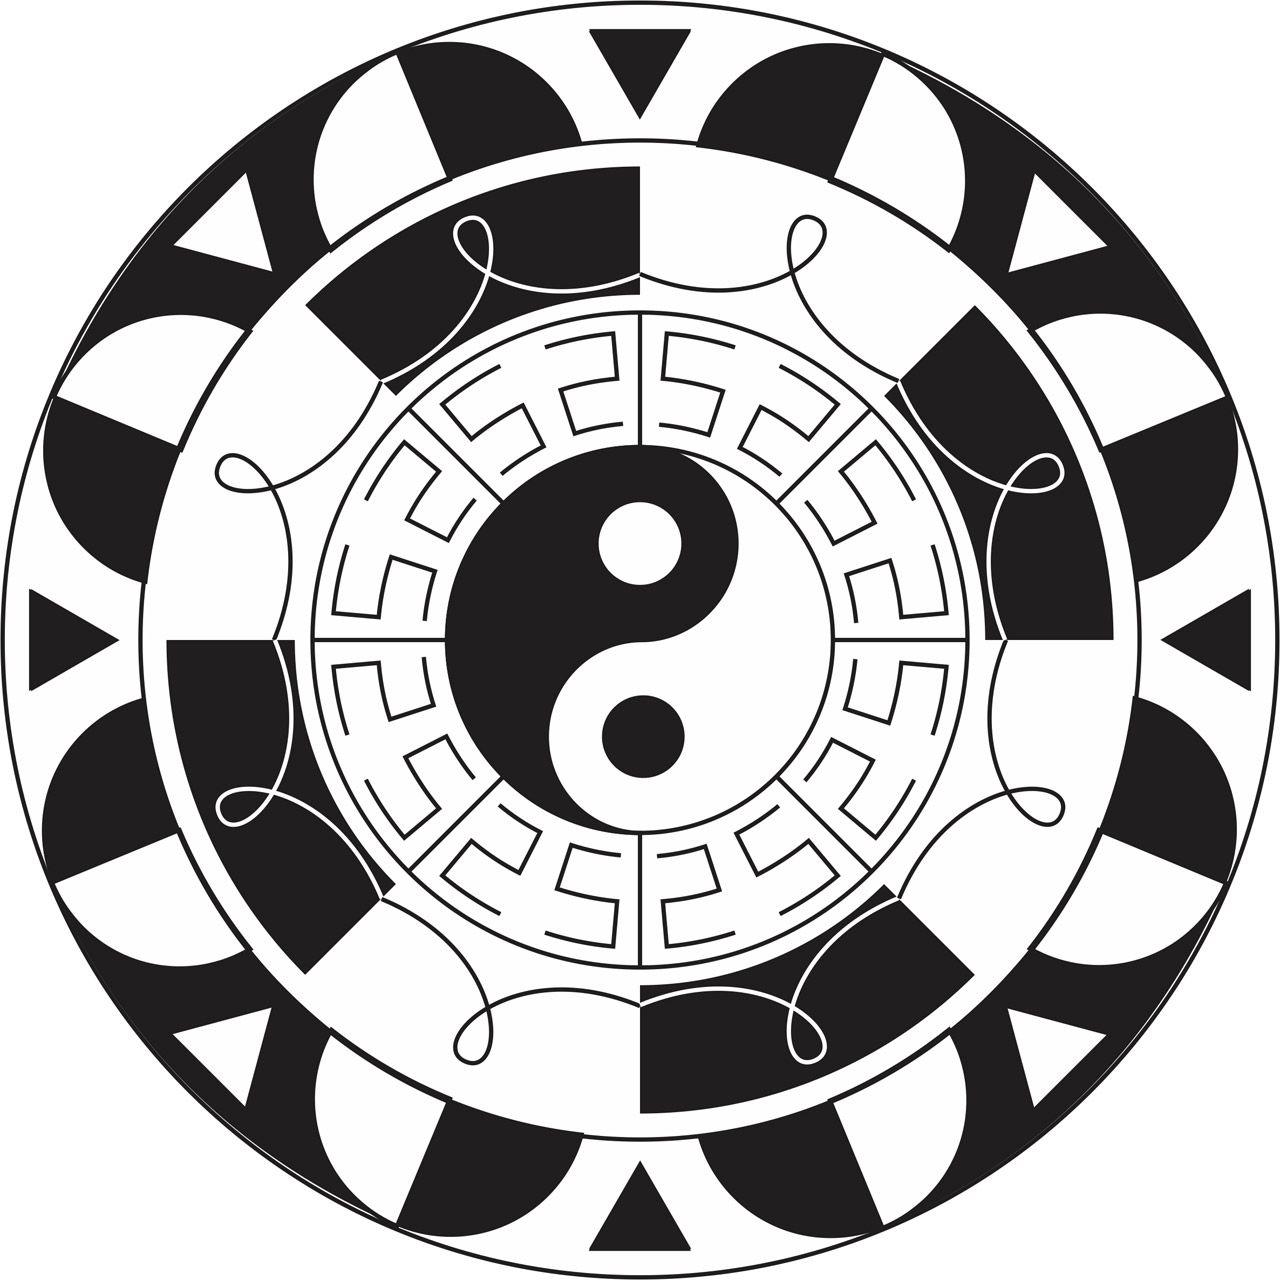 Pin by klaudia veltheim on visual illusion illusione espejismo